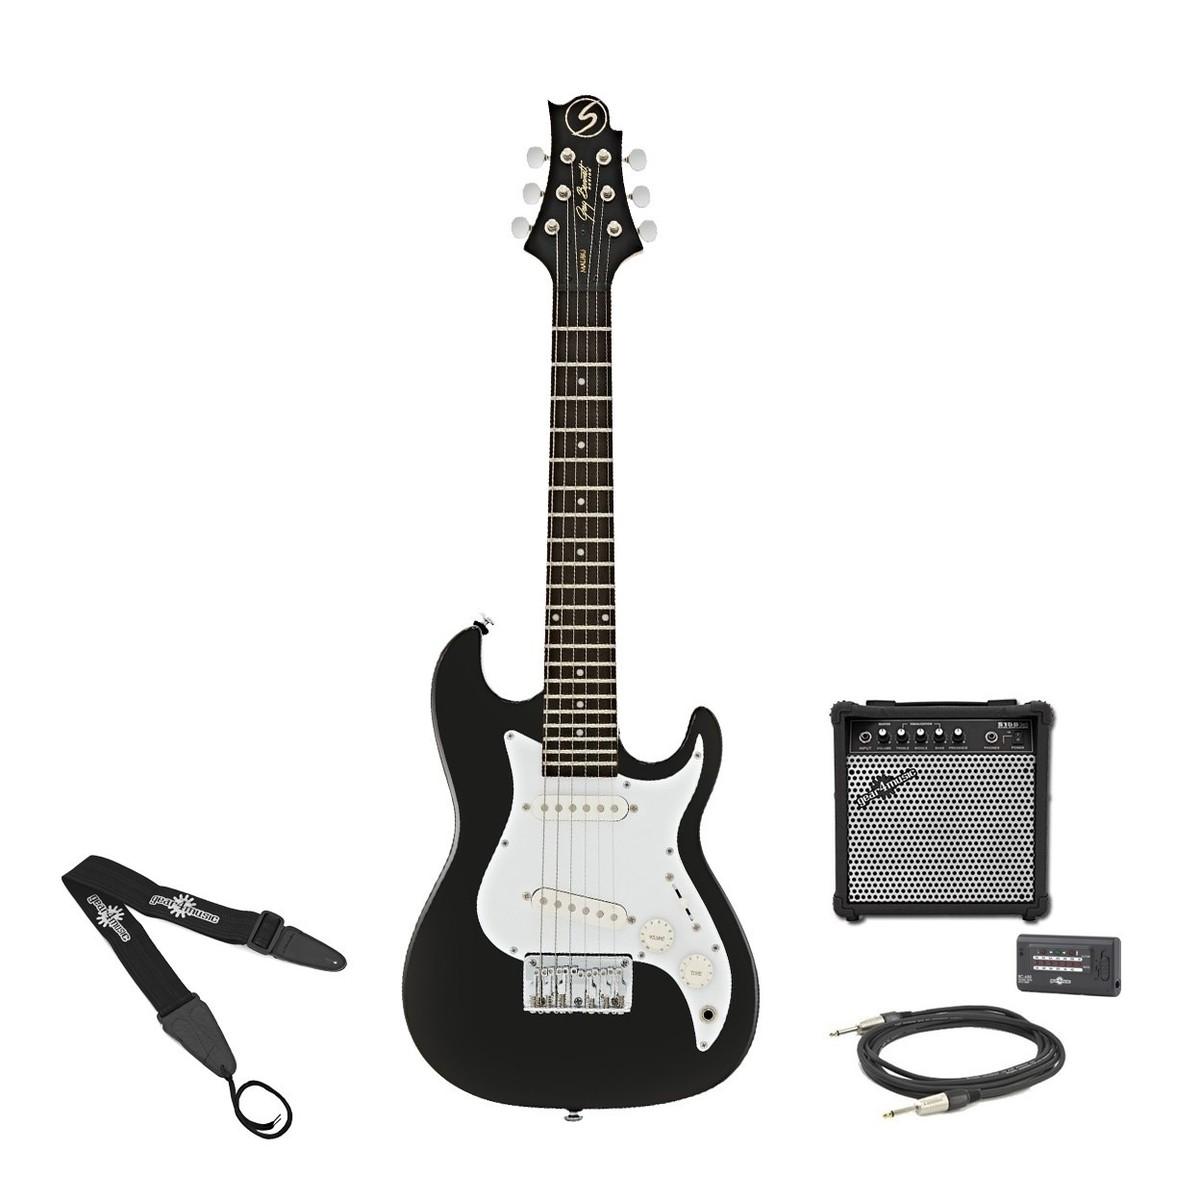 disc greg bennett malibu mmb 1 mini electric guitar amp pack black at gear4music. Black Bedroom Furniture Sets. Home Design Ideas